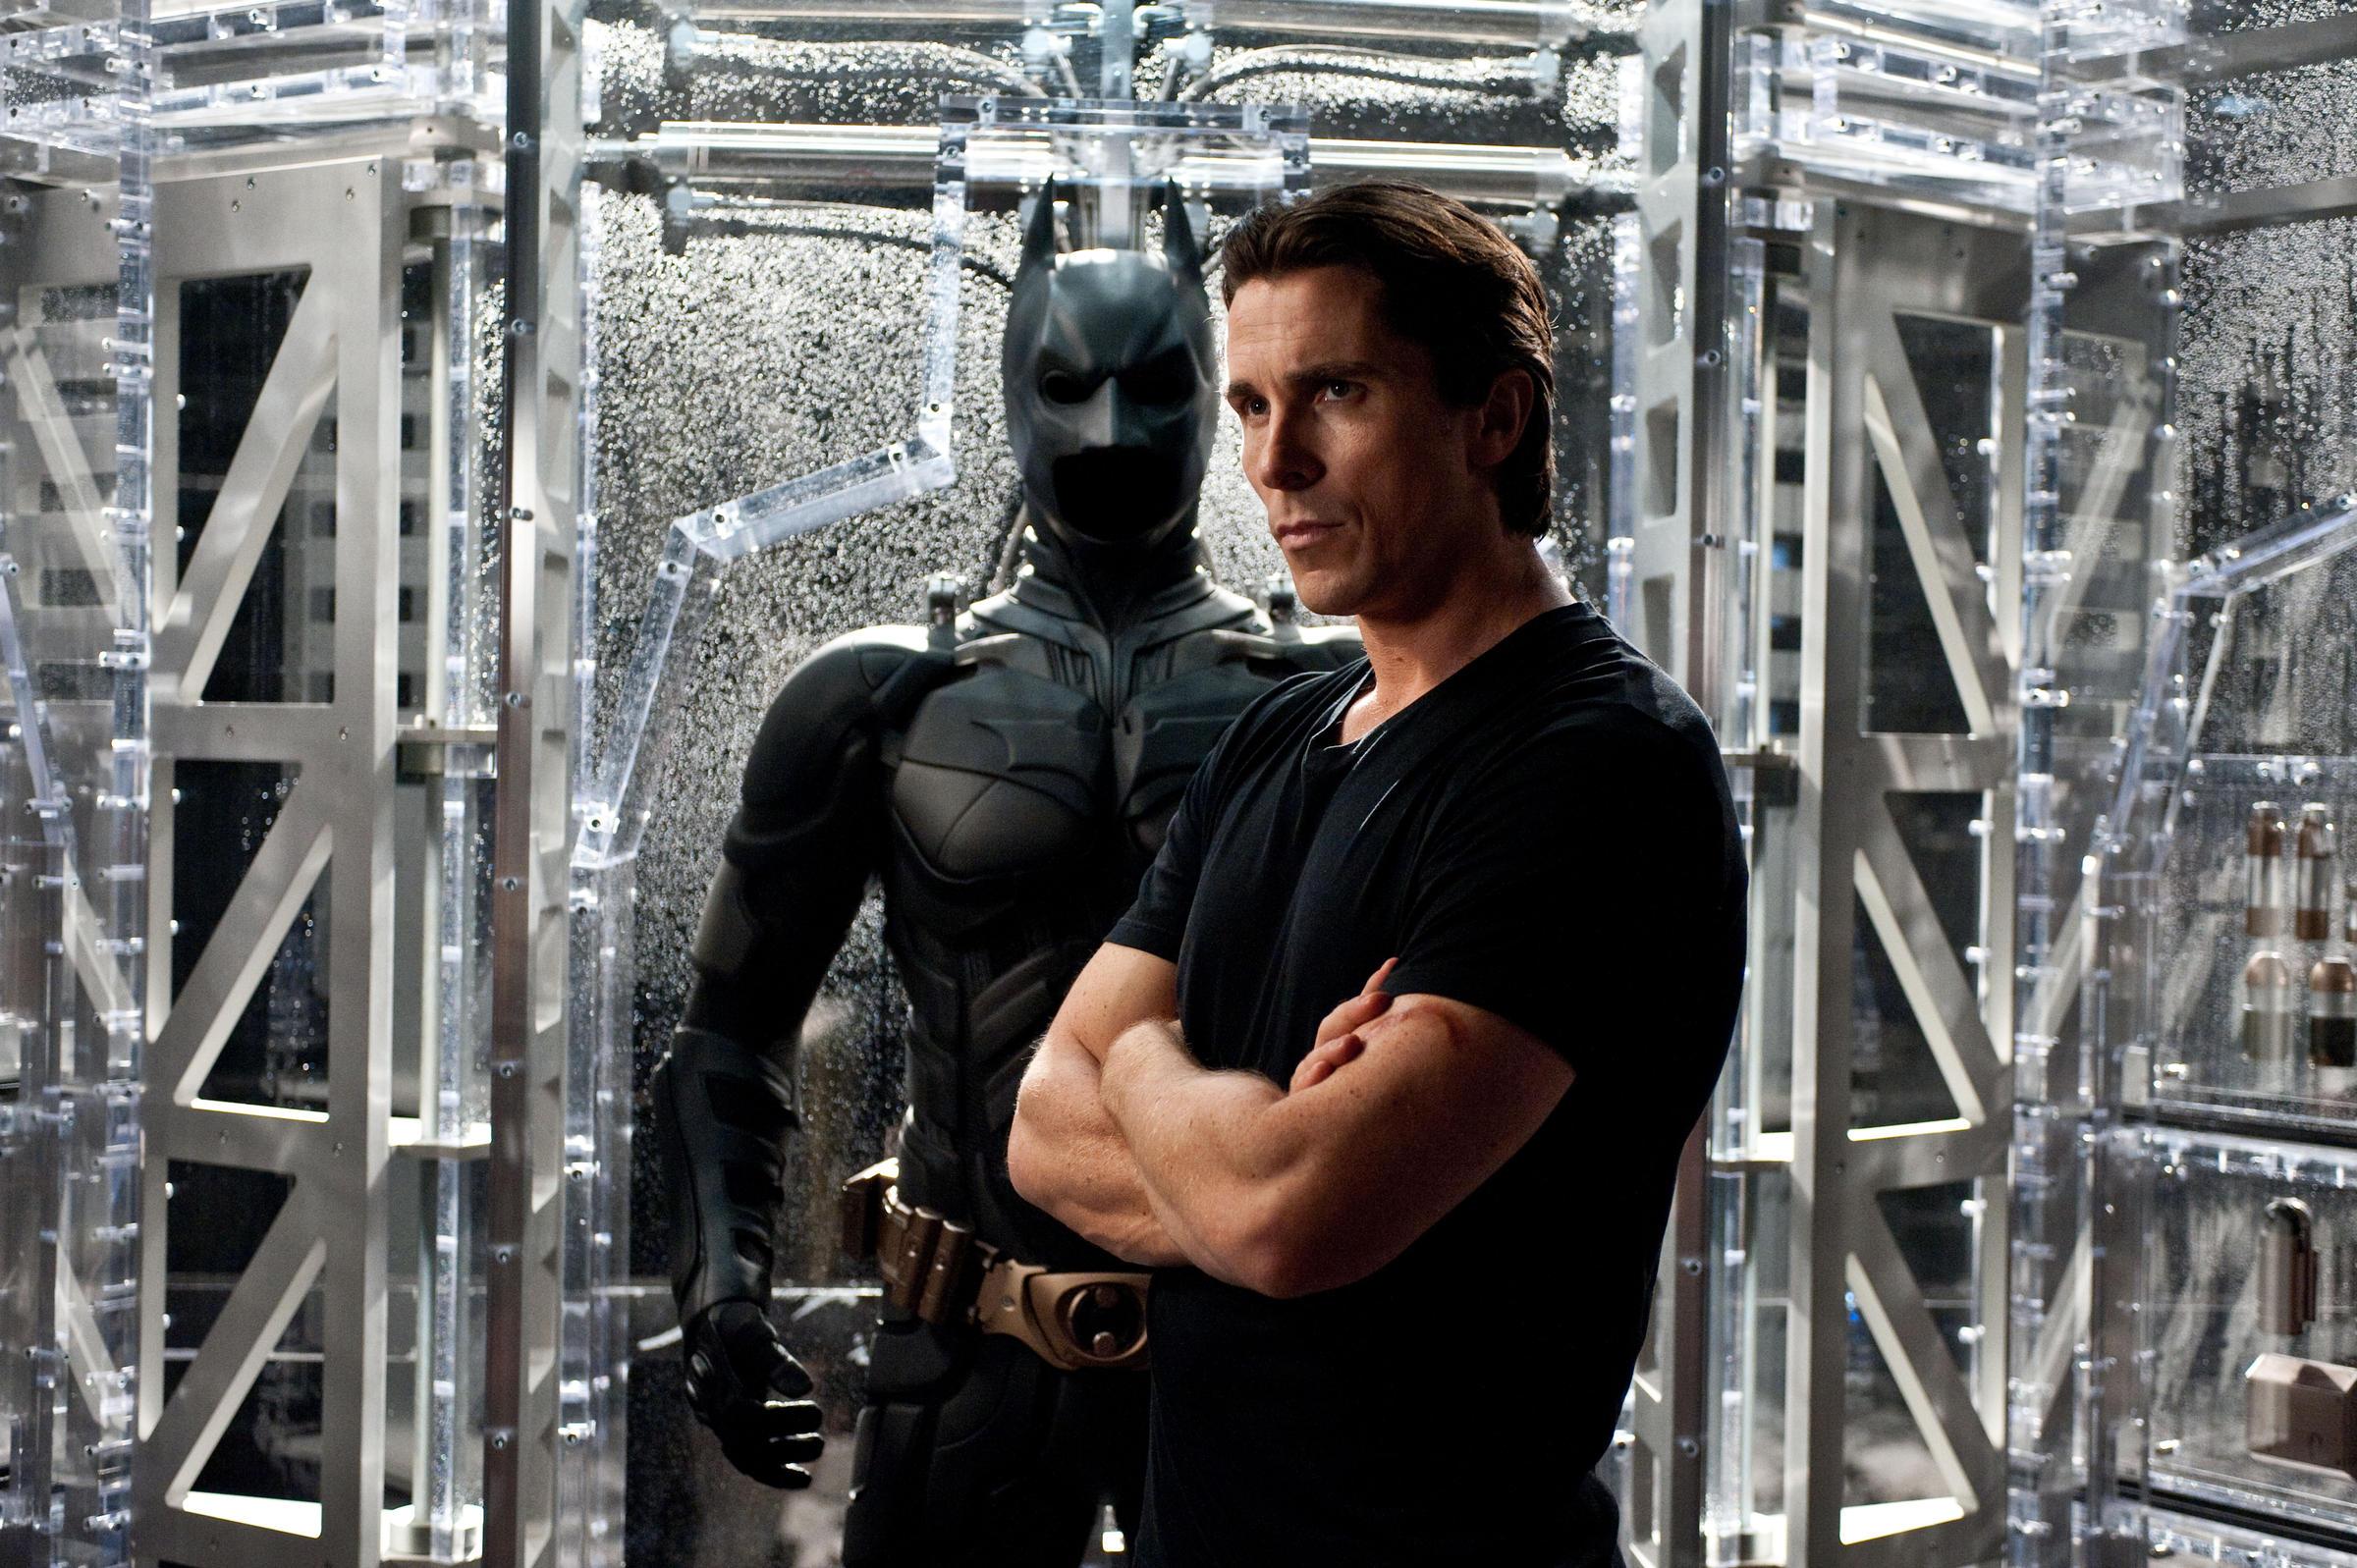 Dark Knight Rises But Saga Ends For Director Nolan Krvs